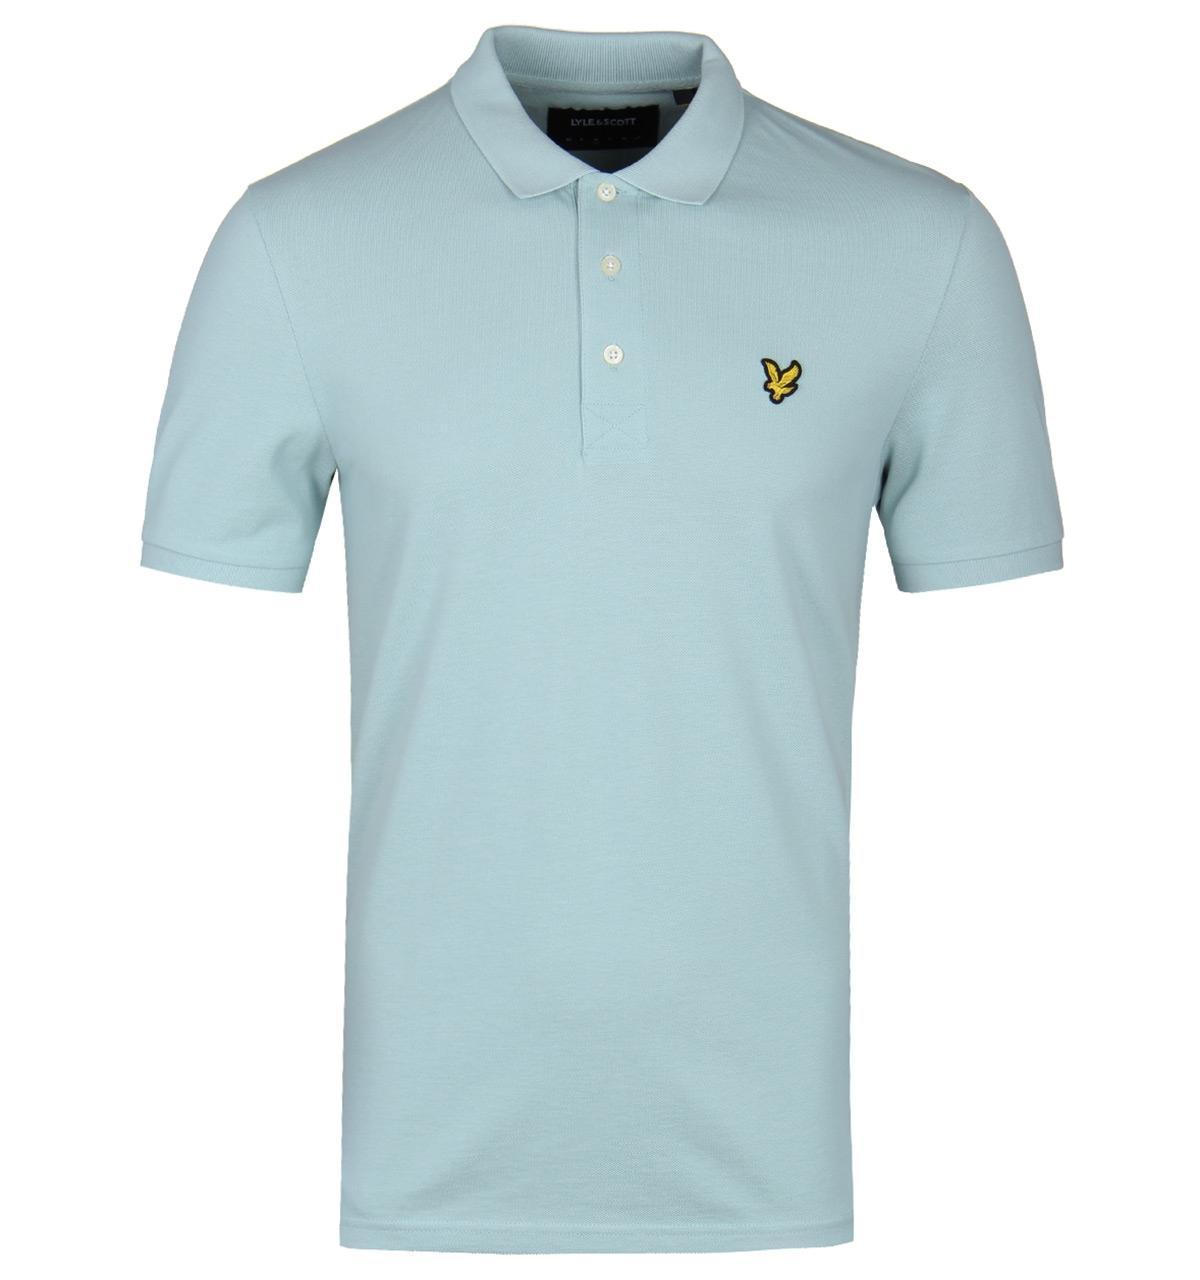 d3e7f2292ae Lyst - Lyle   Scott Powder Blue Short Sleeve Polo Shirt in Blue for Men